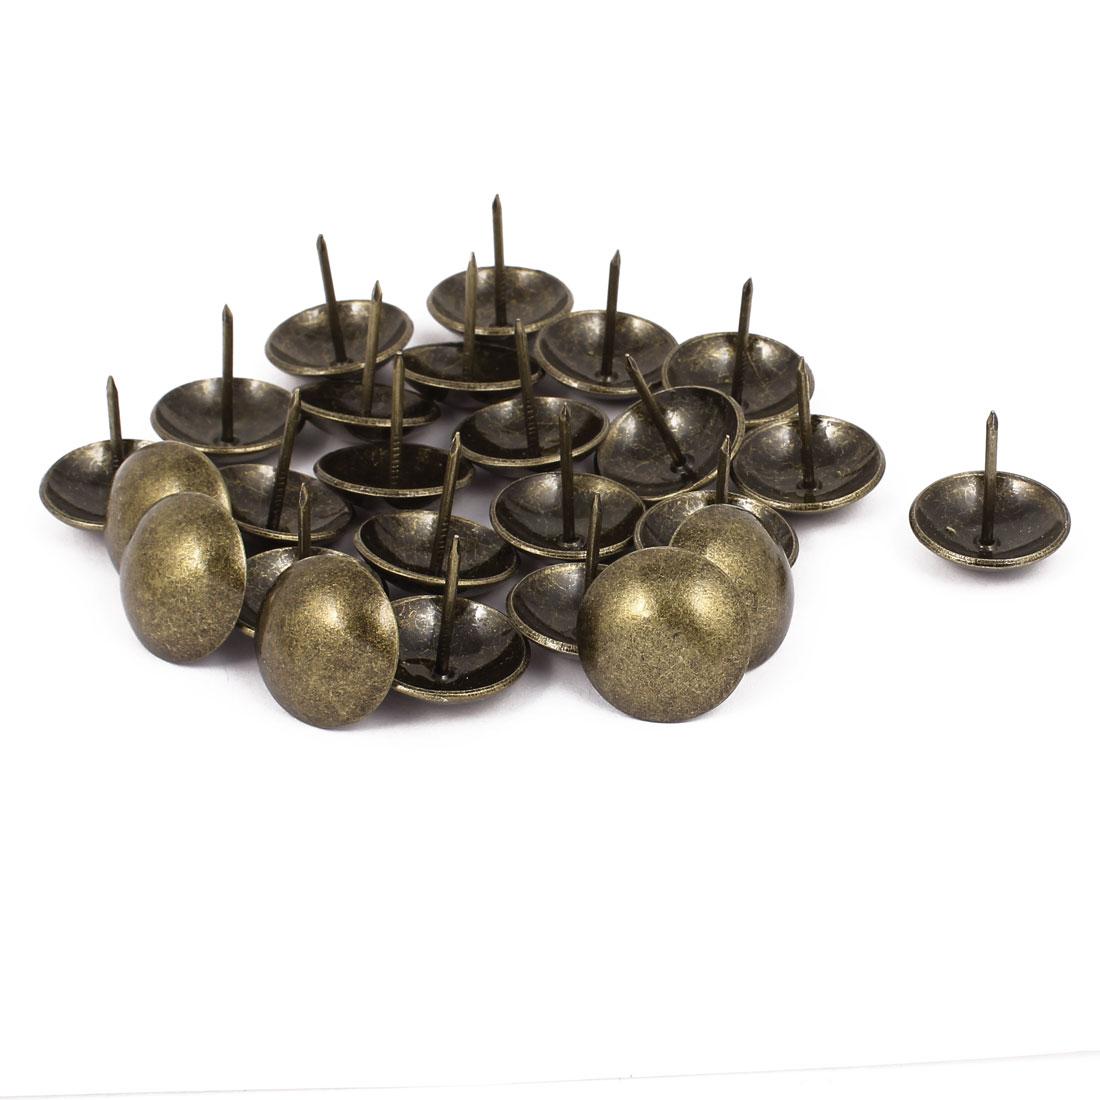 25mm Dia Metal Upholstery Nail Thumb Tack Push Pin Doornail Bronze Tone 25PCS